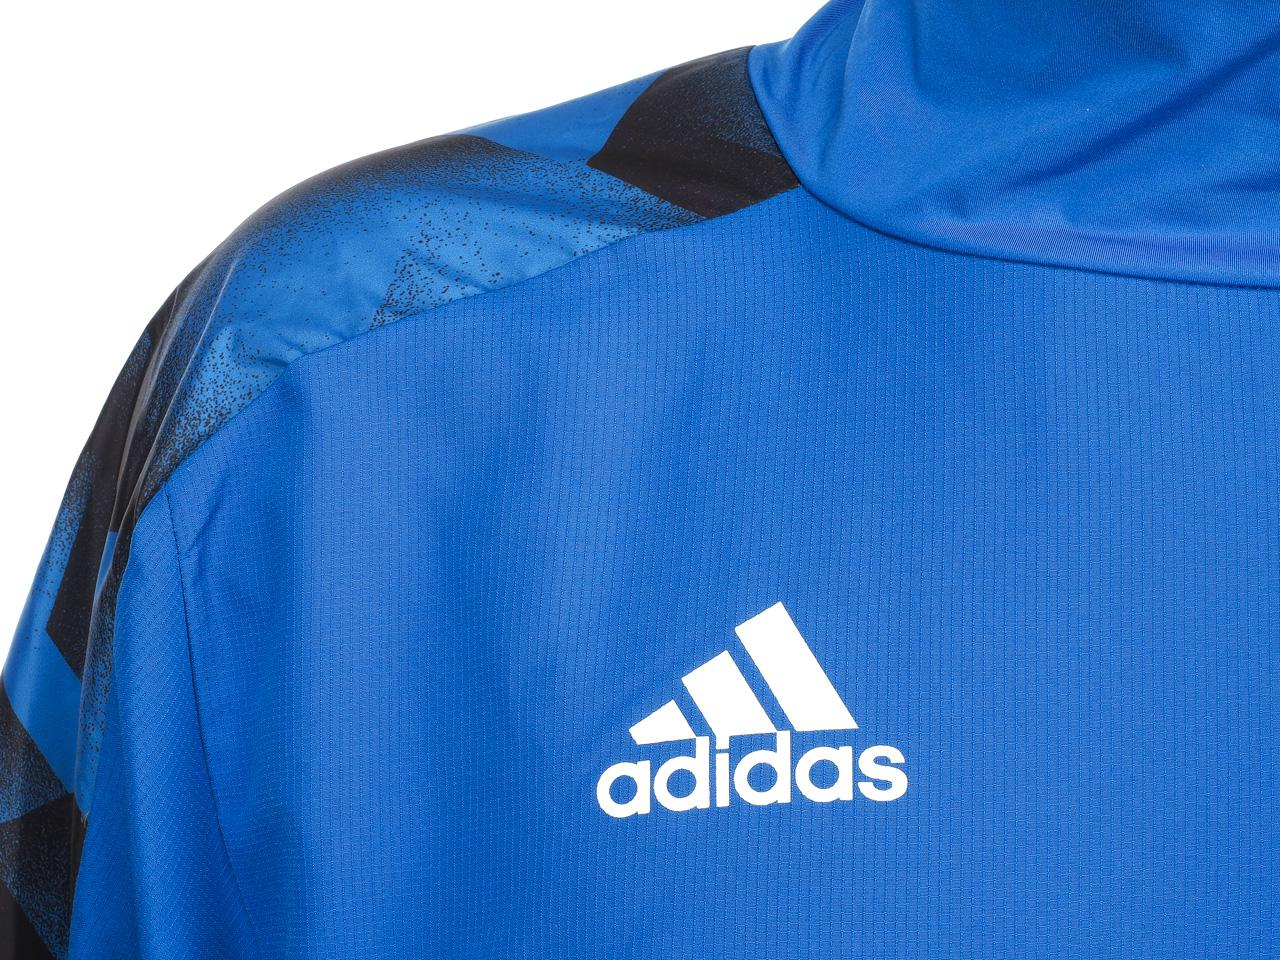 Jacken-Von-Jogginganzug-Tracktops-Adidas-Tanc-Wov-Spur-Blau-Blau-75956-Neu Indexbild 3